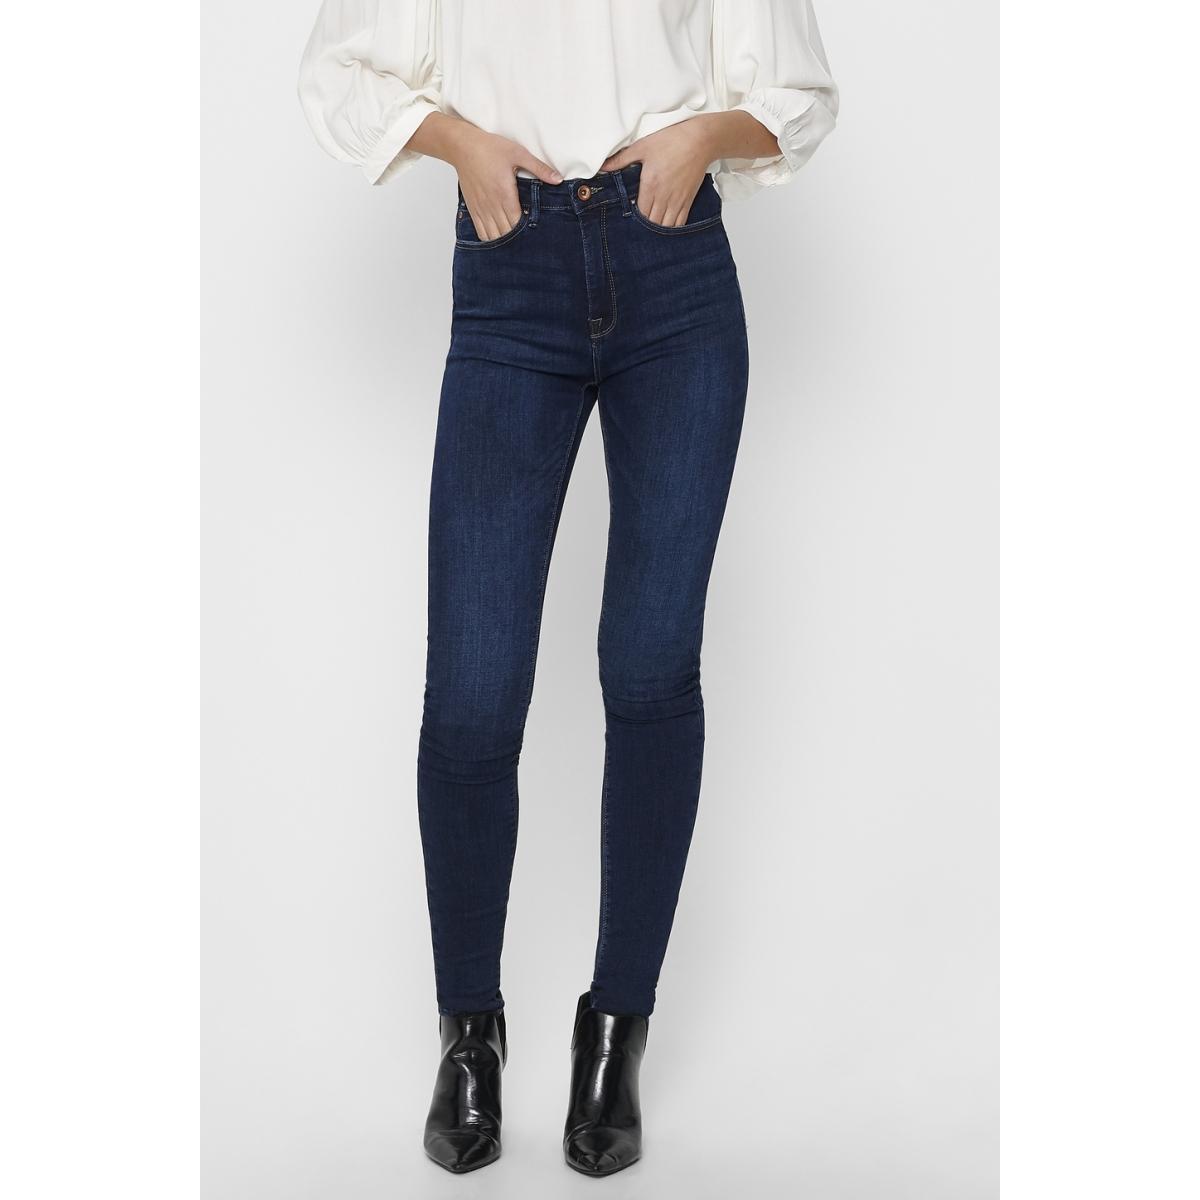 onlpaola hw sk dnm jeans azgz878 noos 15165780 only jeans dark blue denim